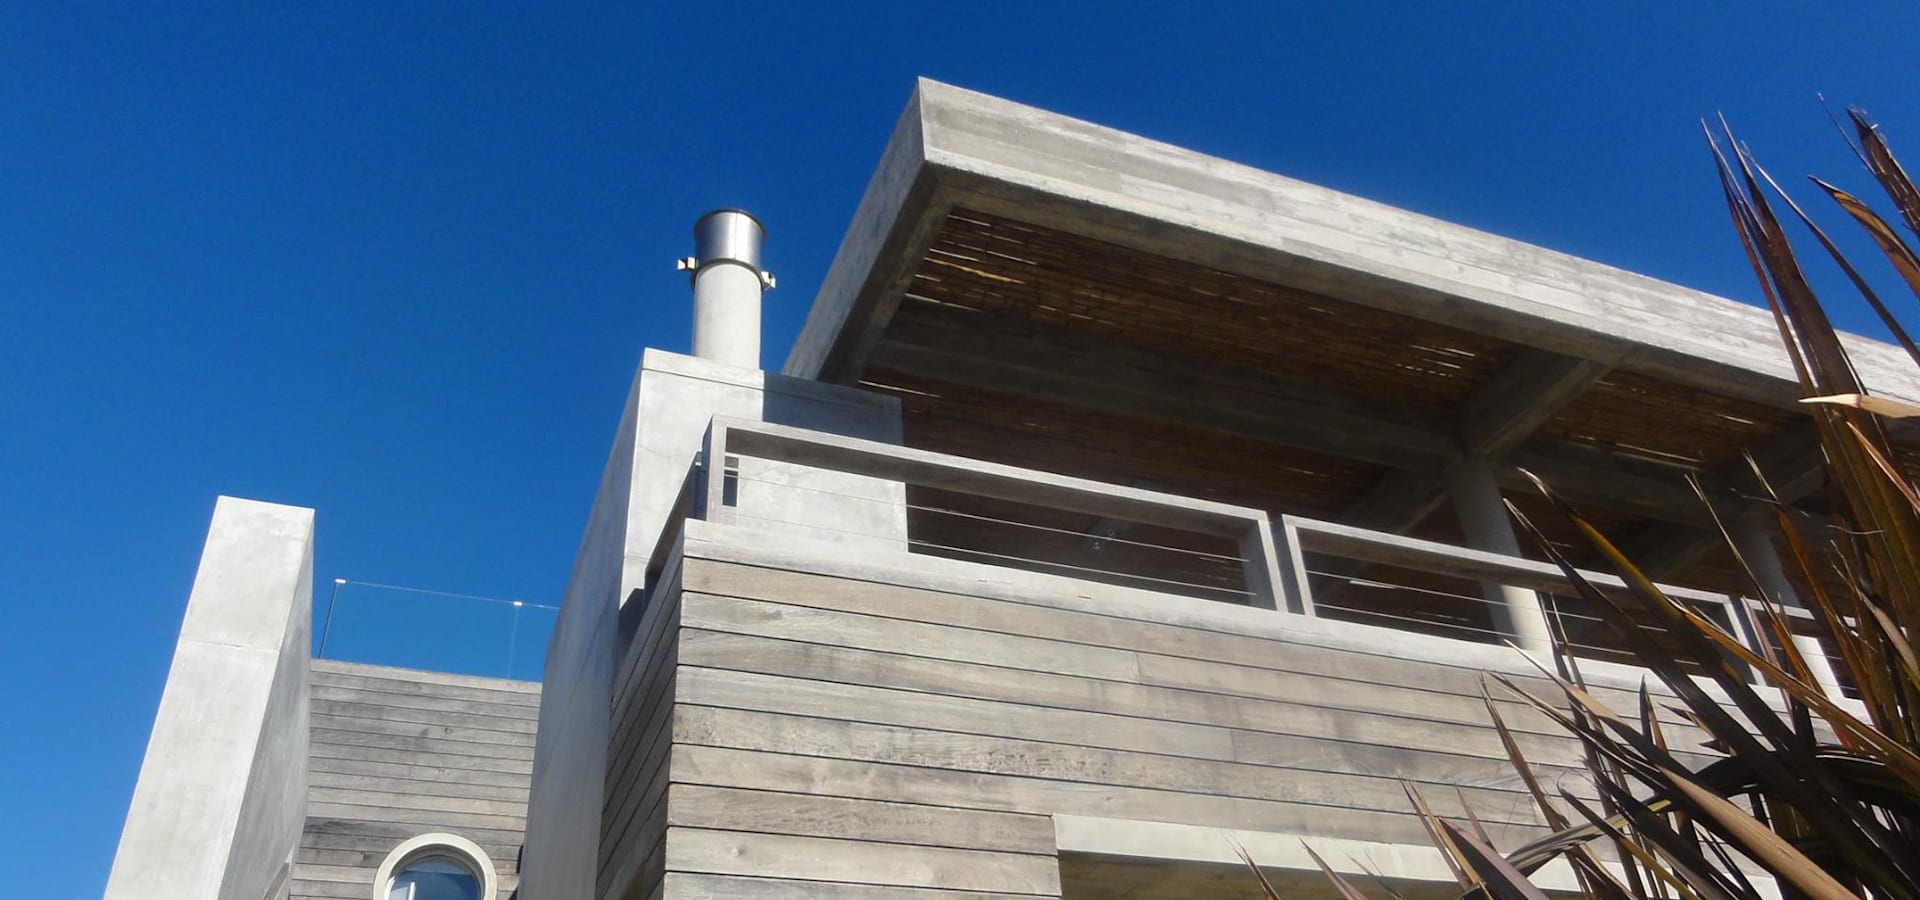 Casa la familia by estudio de arquitectura vivian avella for Estudio de arquitectura